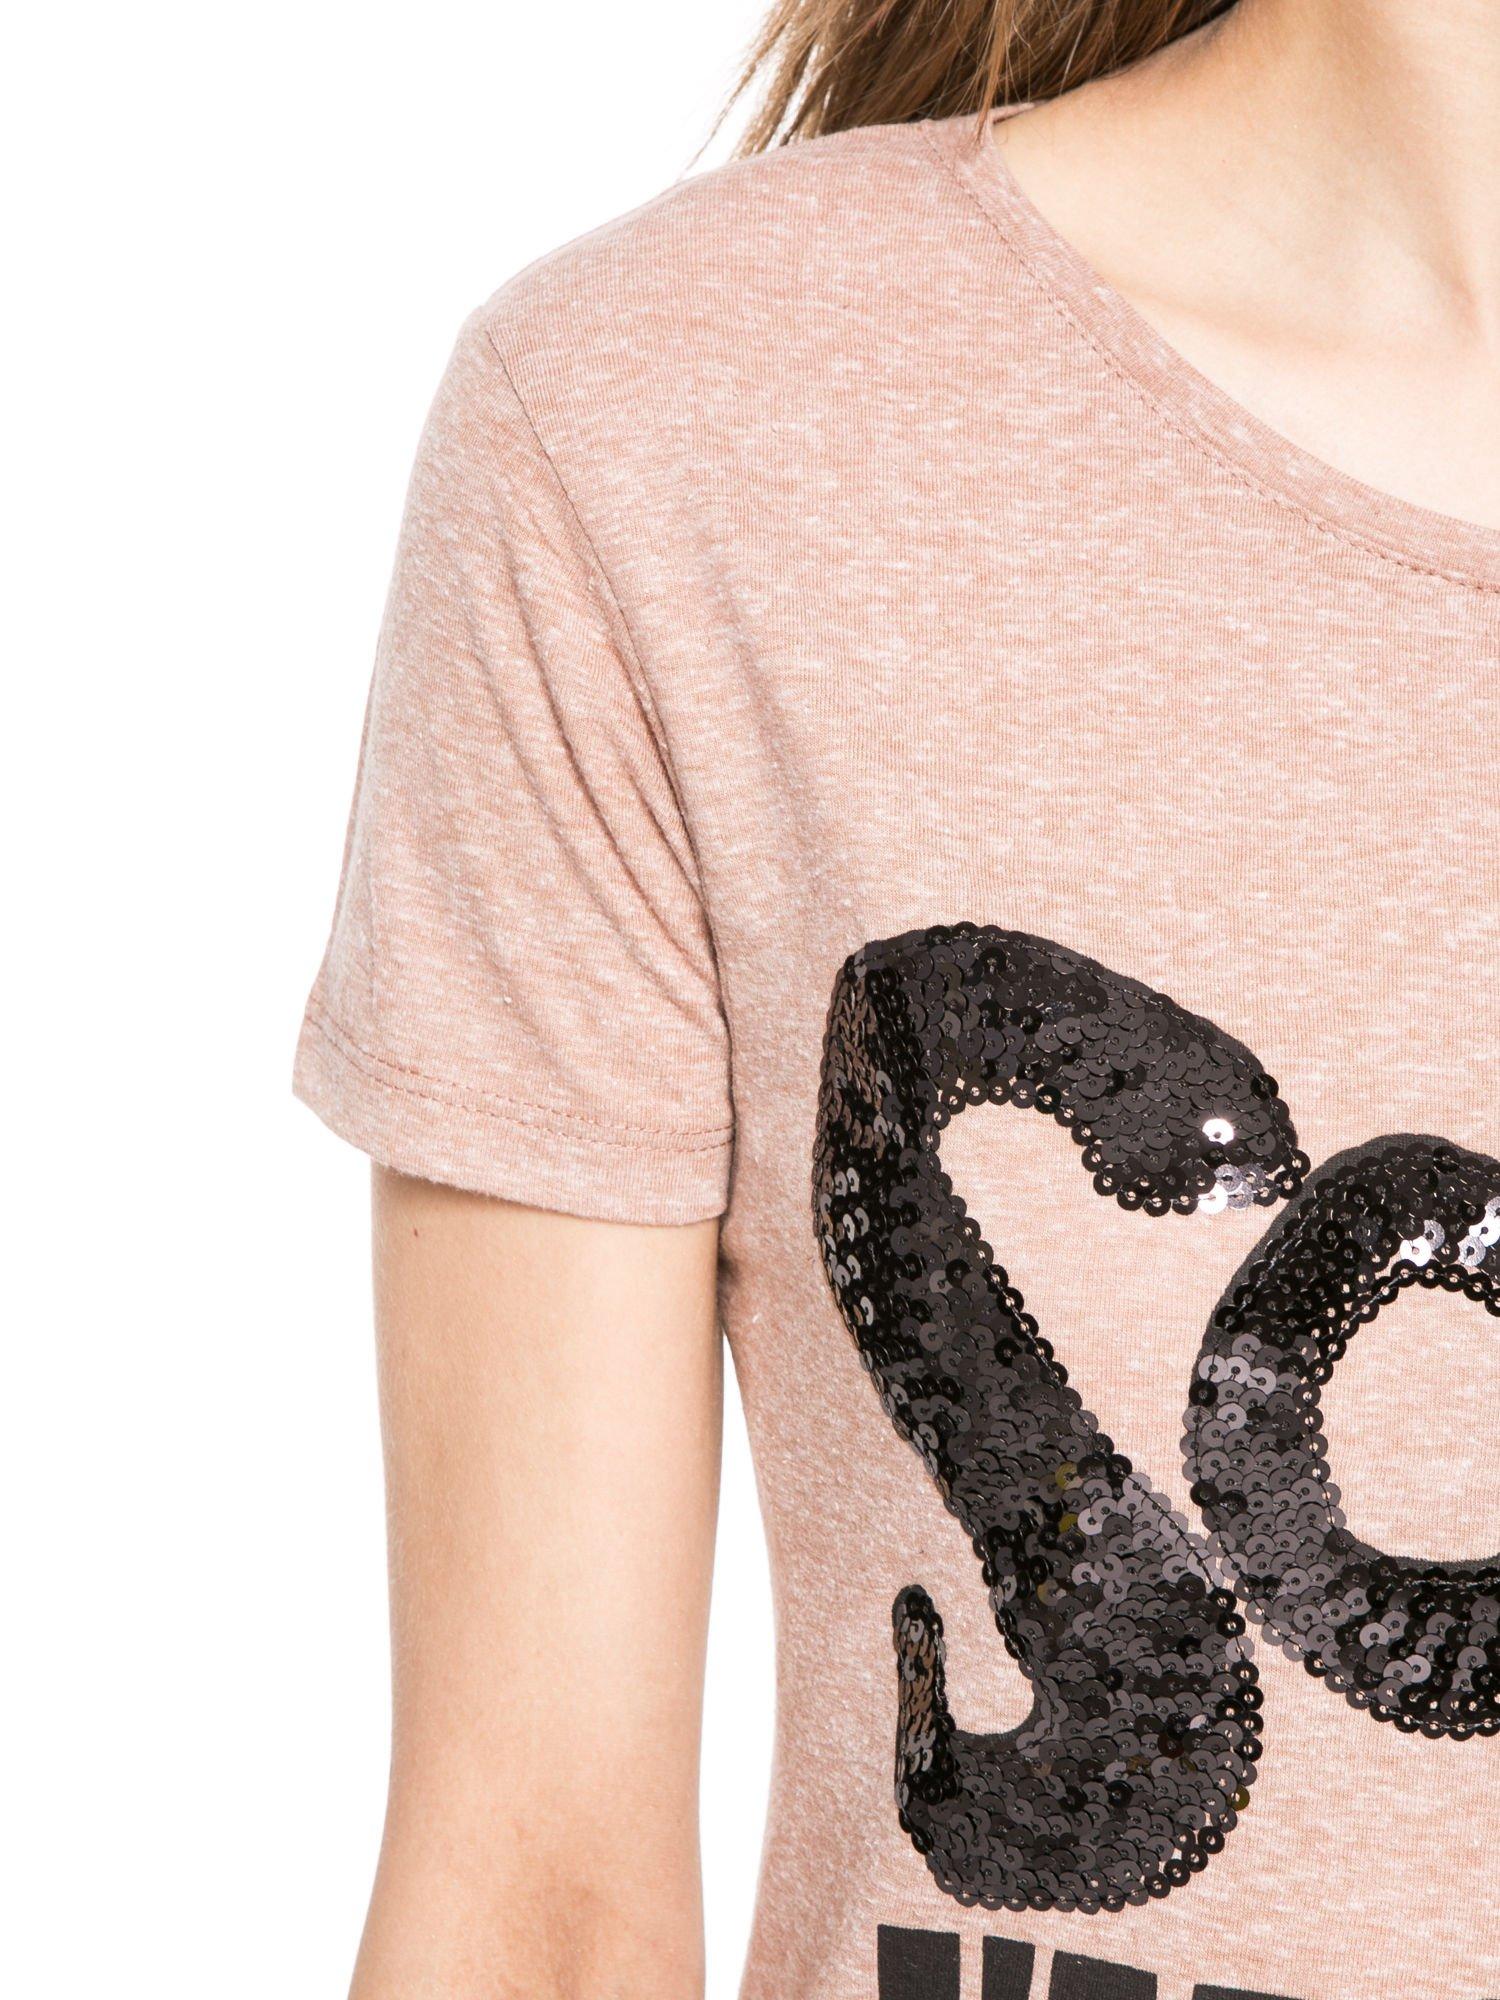 Jasnoborodowy t-shirt z napisem SORRY I'M SUPER FRESH z dżetami                                  zdj.                                  5